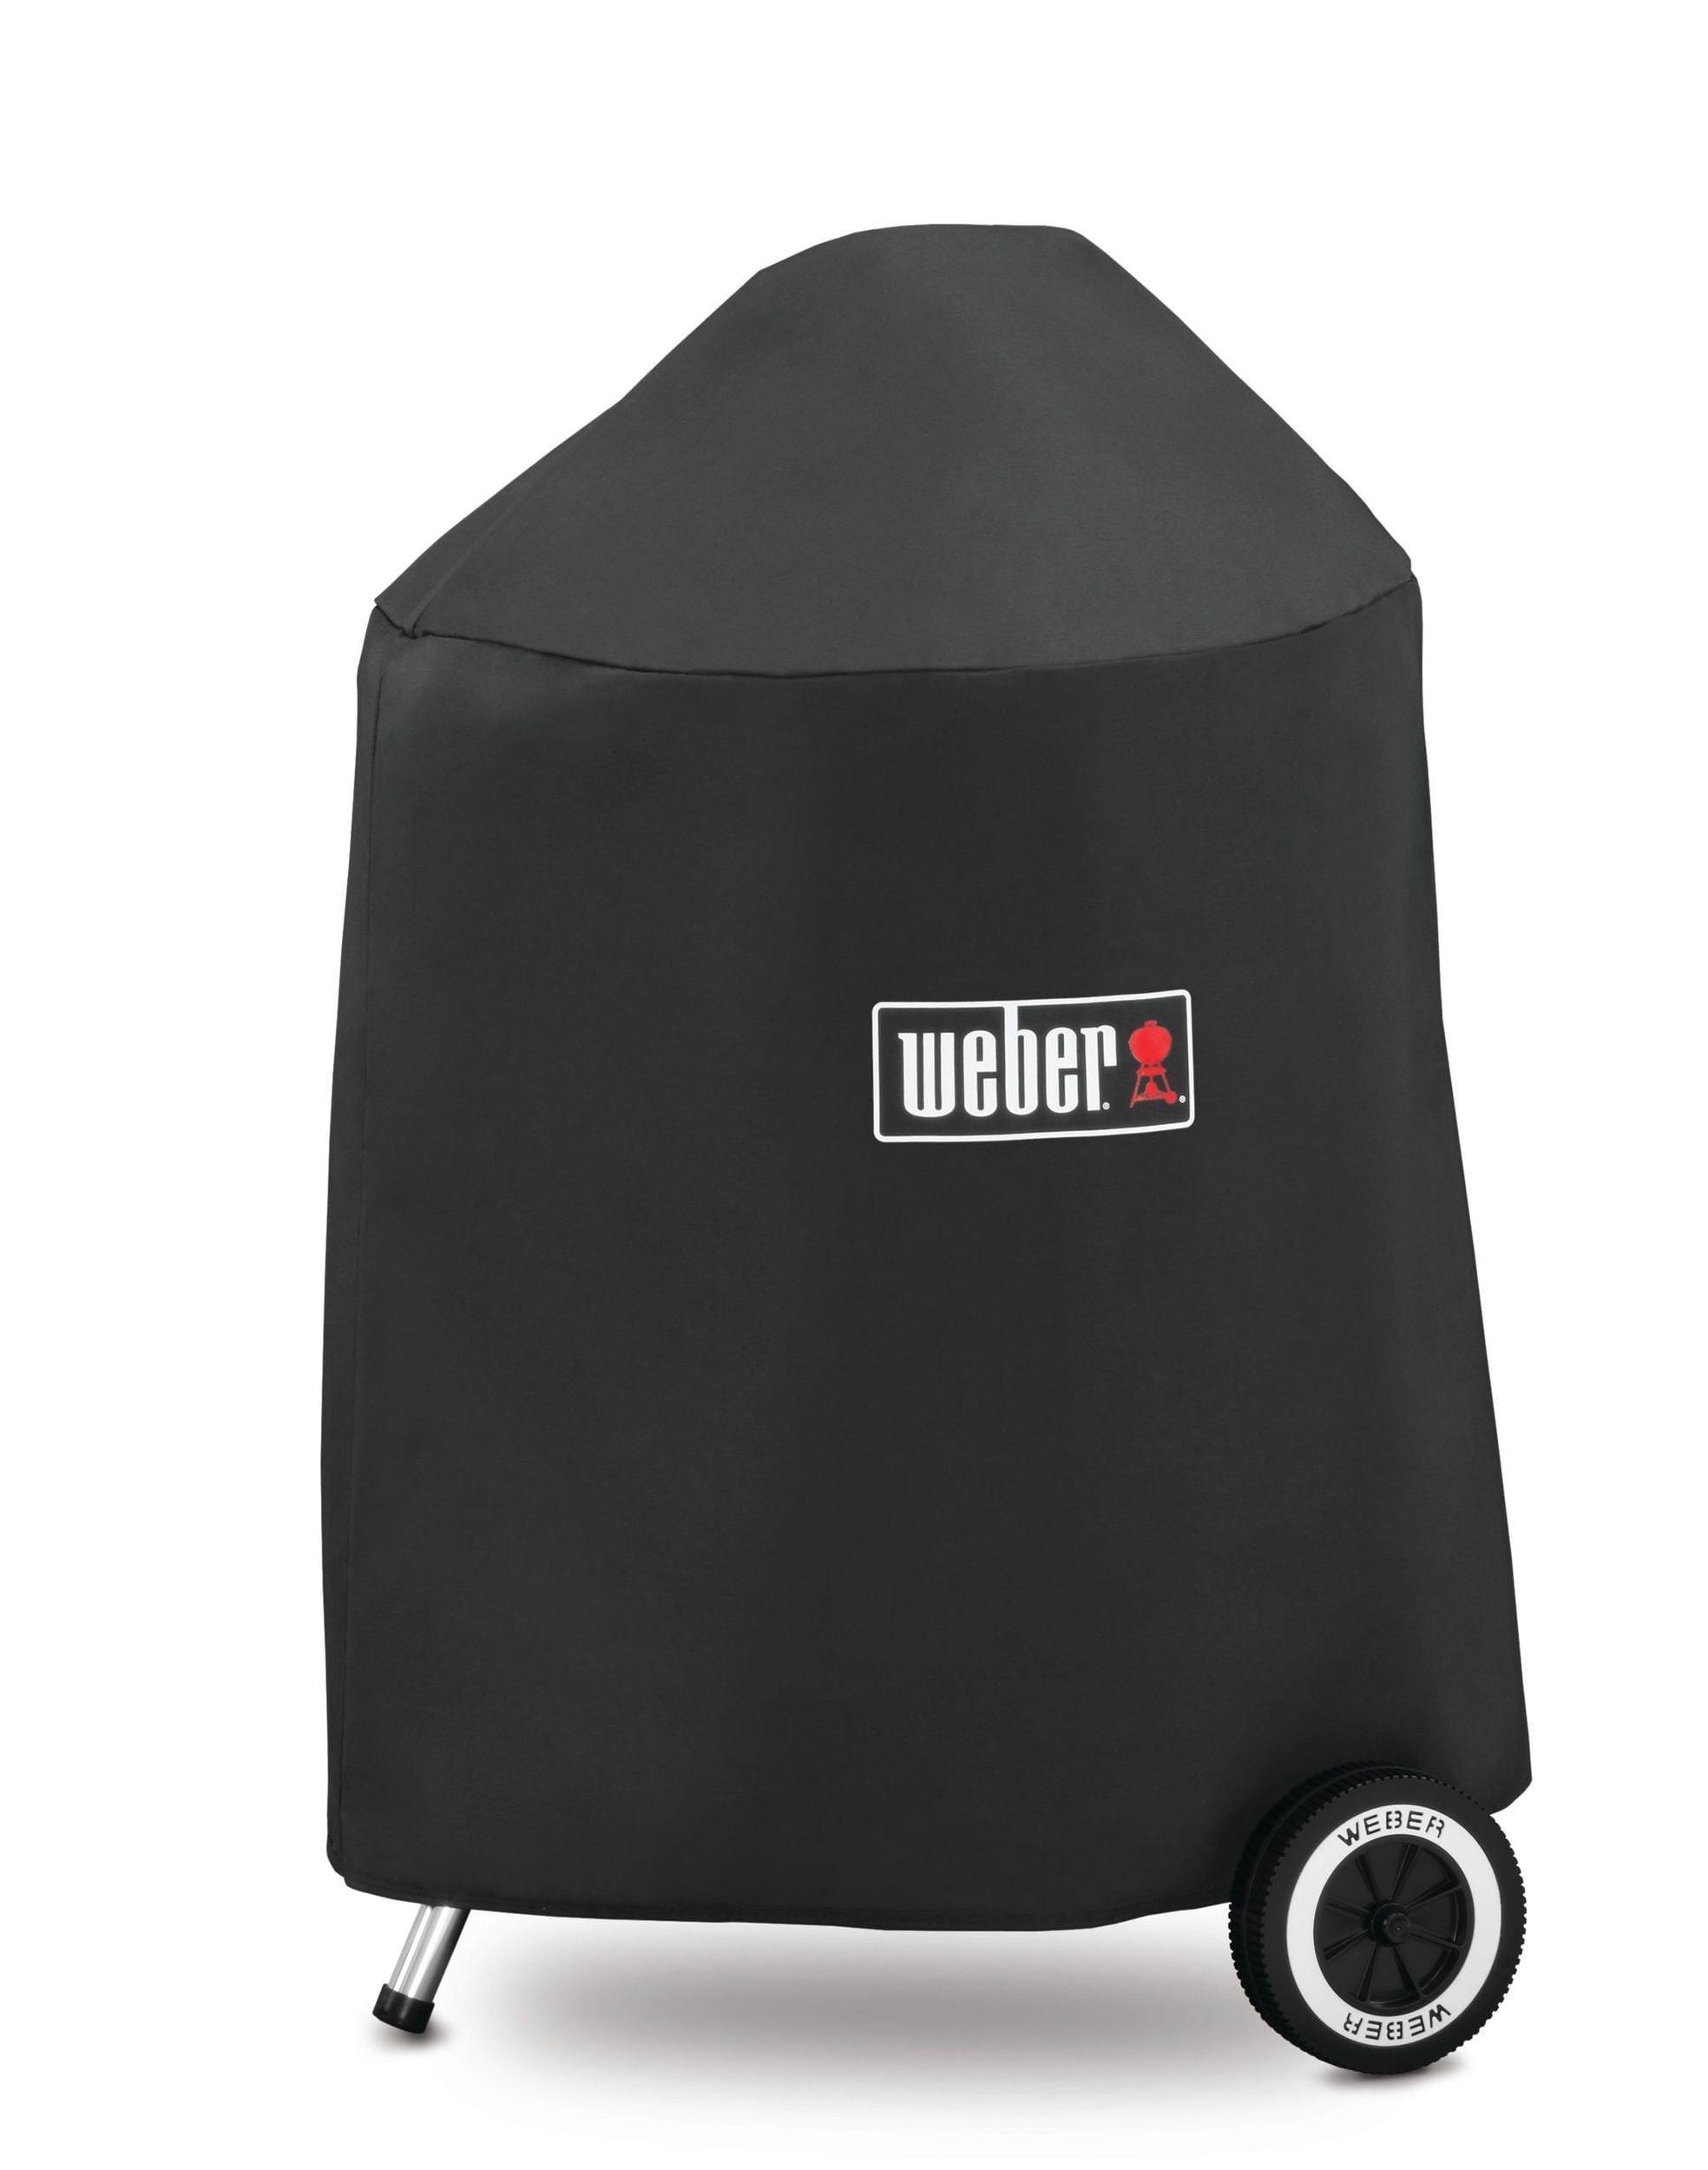 Weber Luxe Hoes voor Houtskoolbarbecues